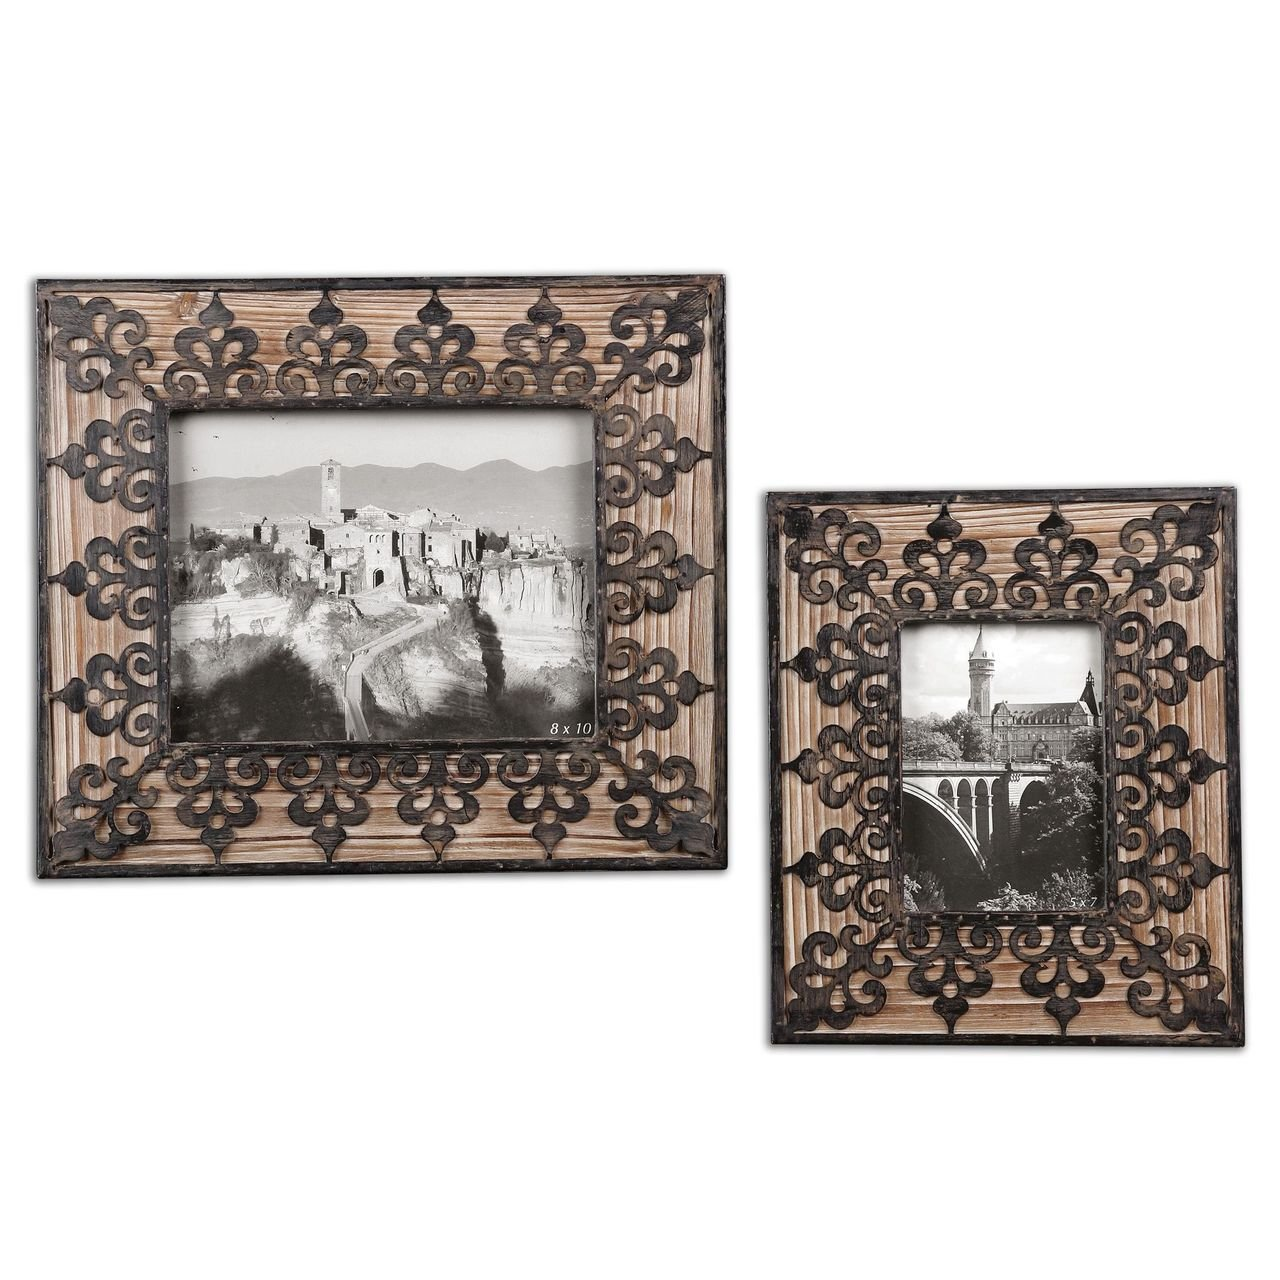 Amazon.de: Spanische Gothic-Bilderrahmen, rustikal, Holz, 3-teilig ...